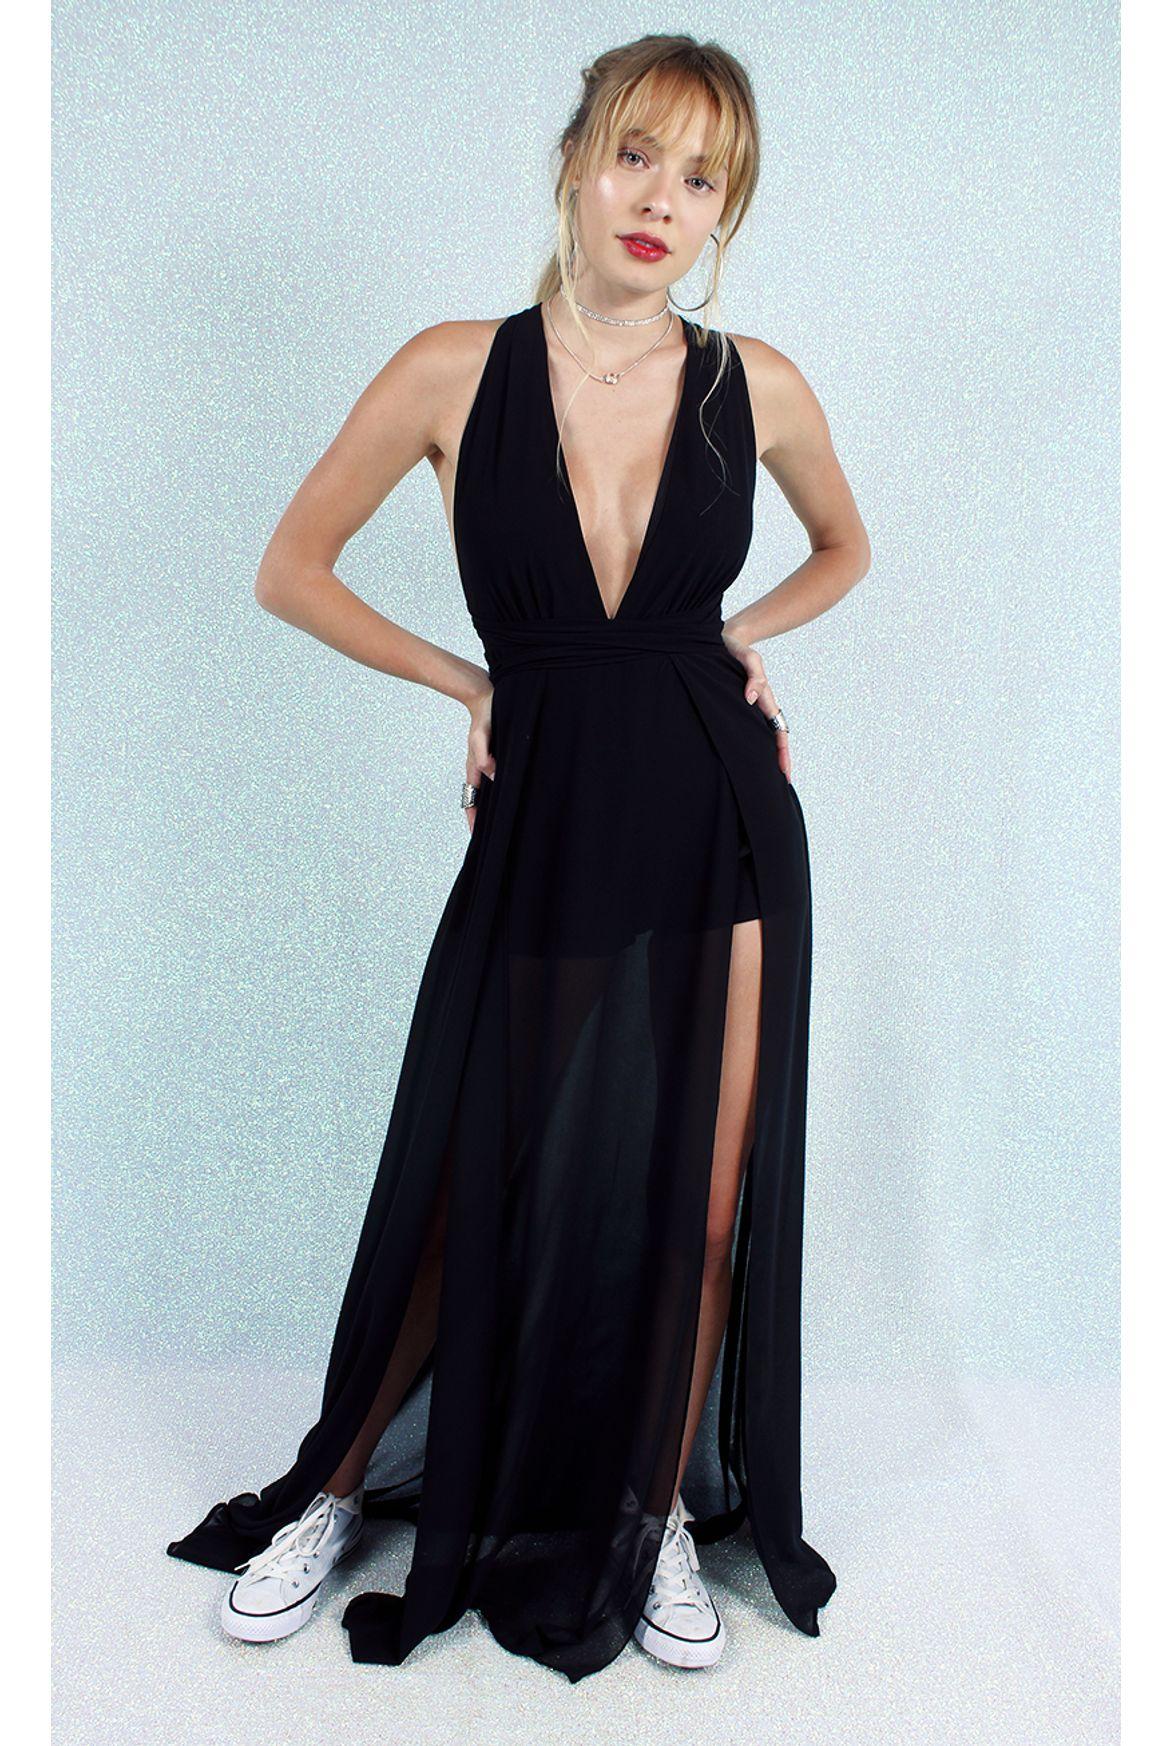 Fshn Vestido Sara Longo W Fendas Preto Fashion Closet